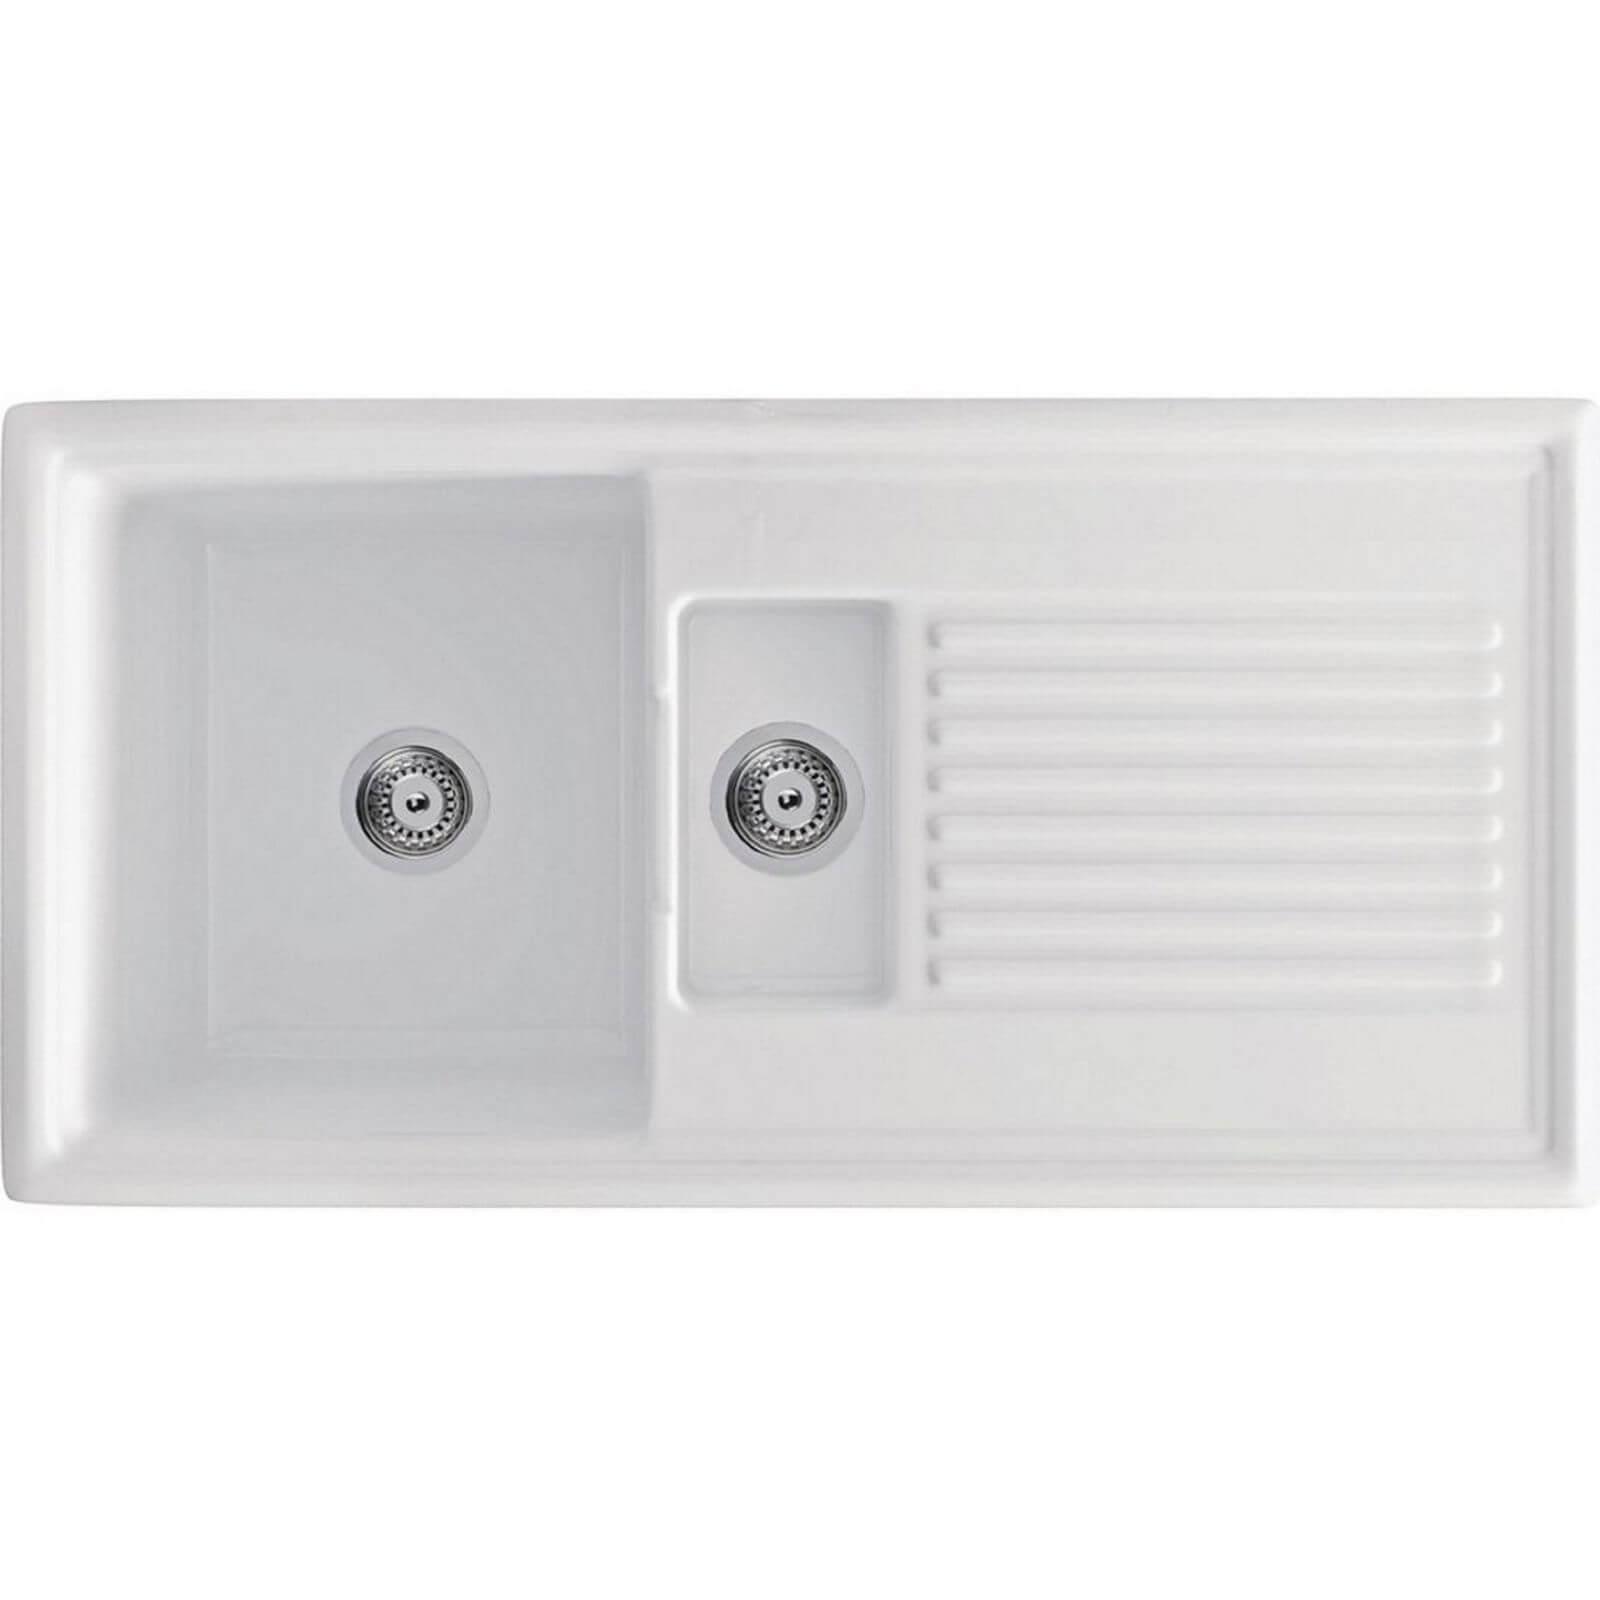 Carron Phoenix Sienna Ceramic Reversible Kitchen Sink - 1.5 Bowl